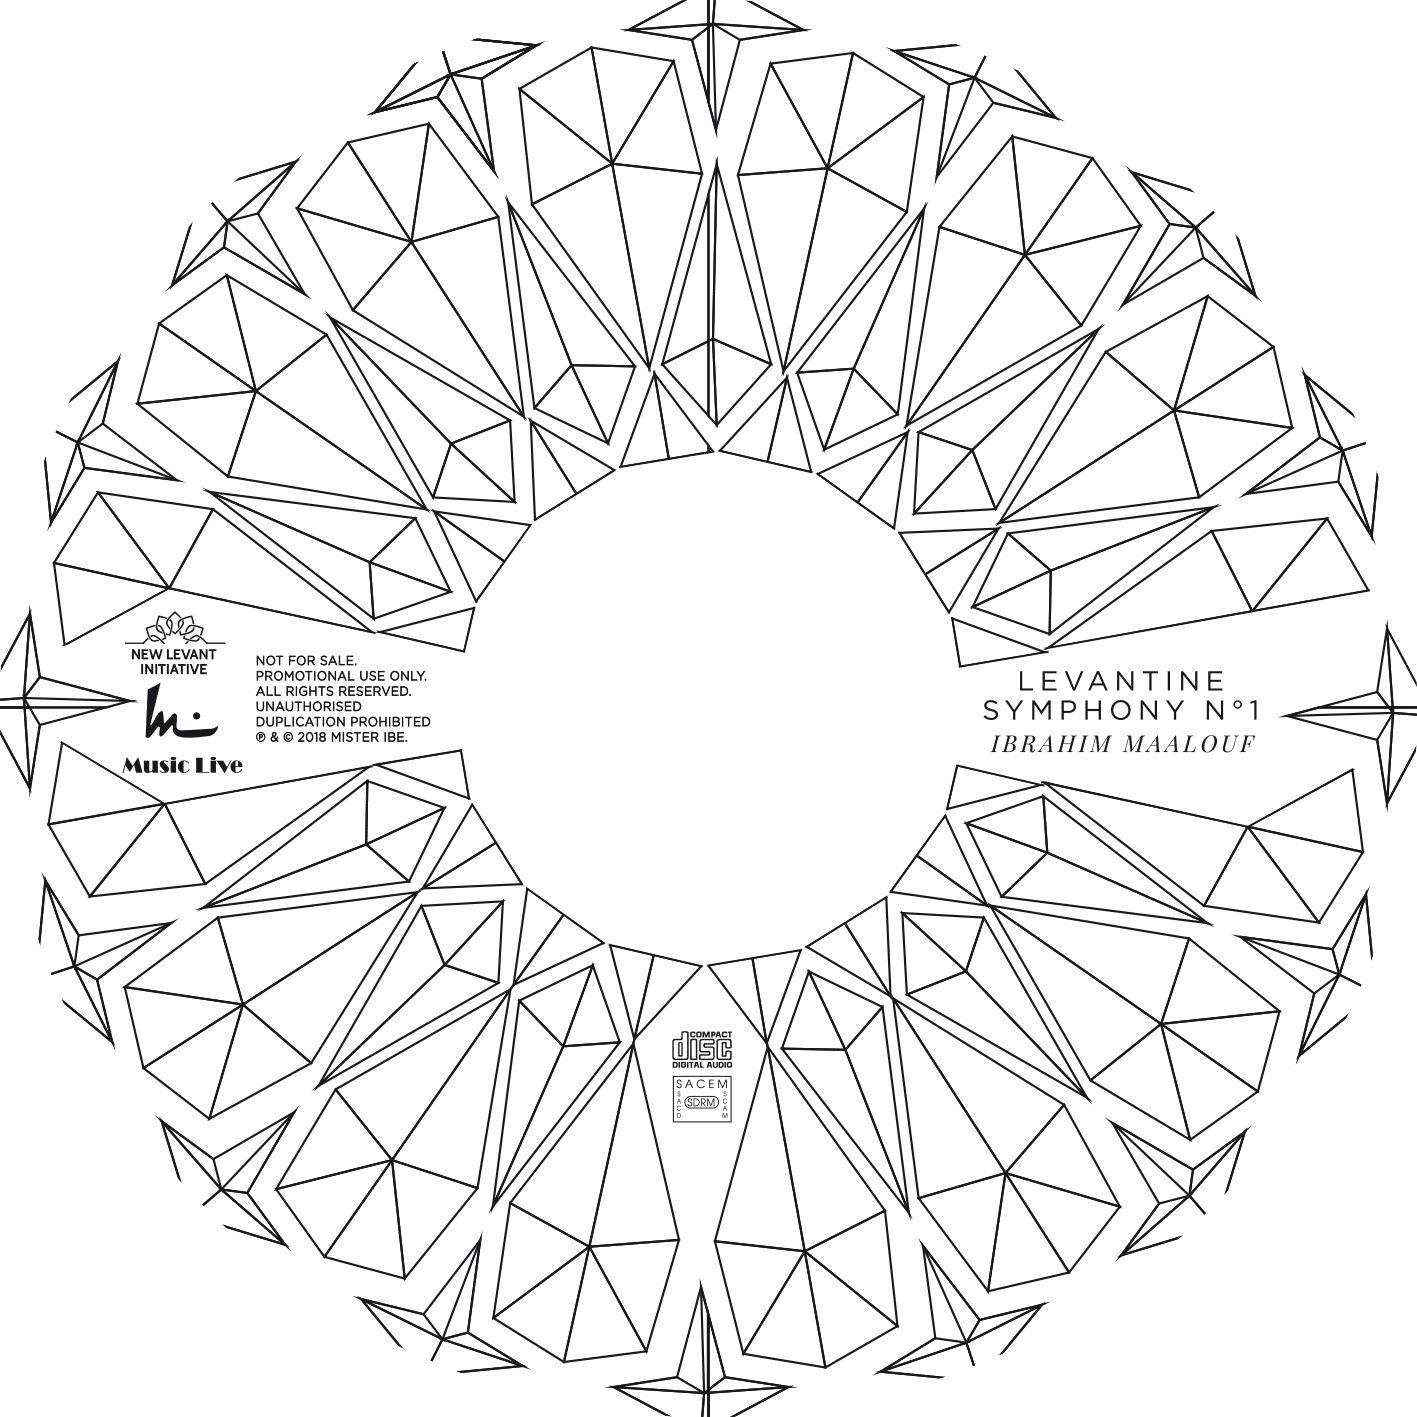 Ibrahim Maalouf - artwork  Levantine Symphony N° 1